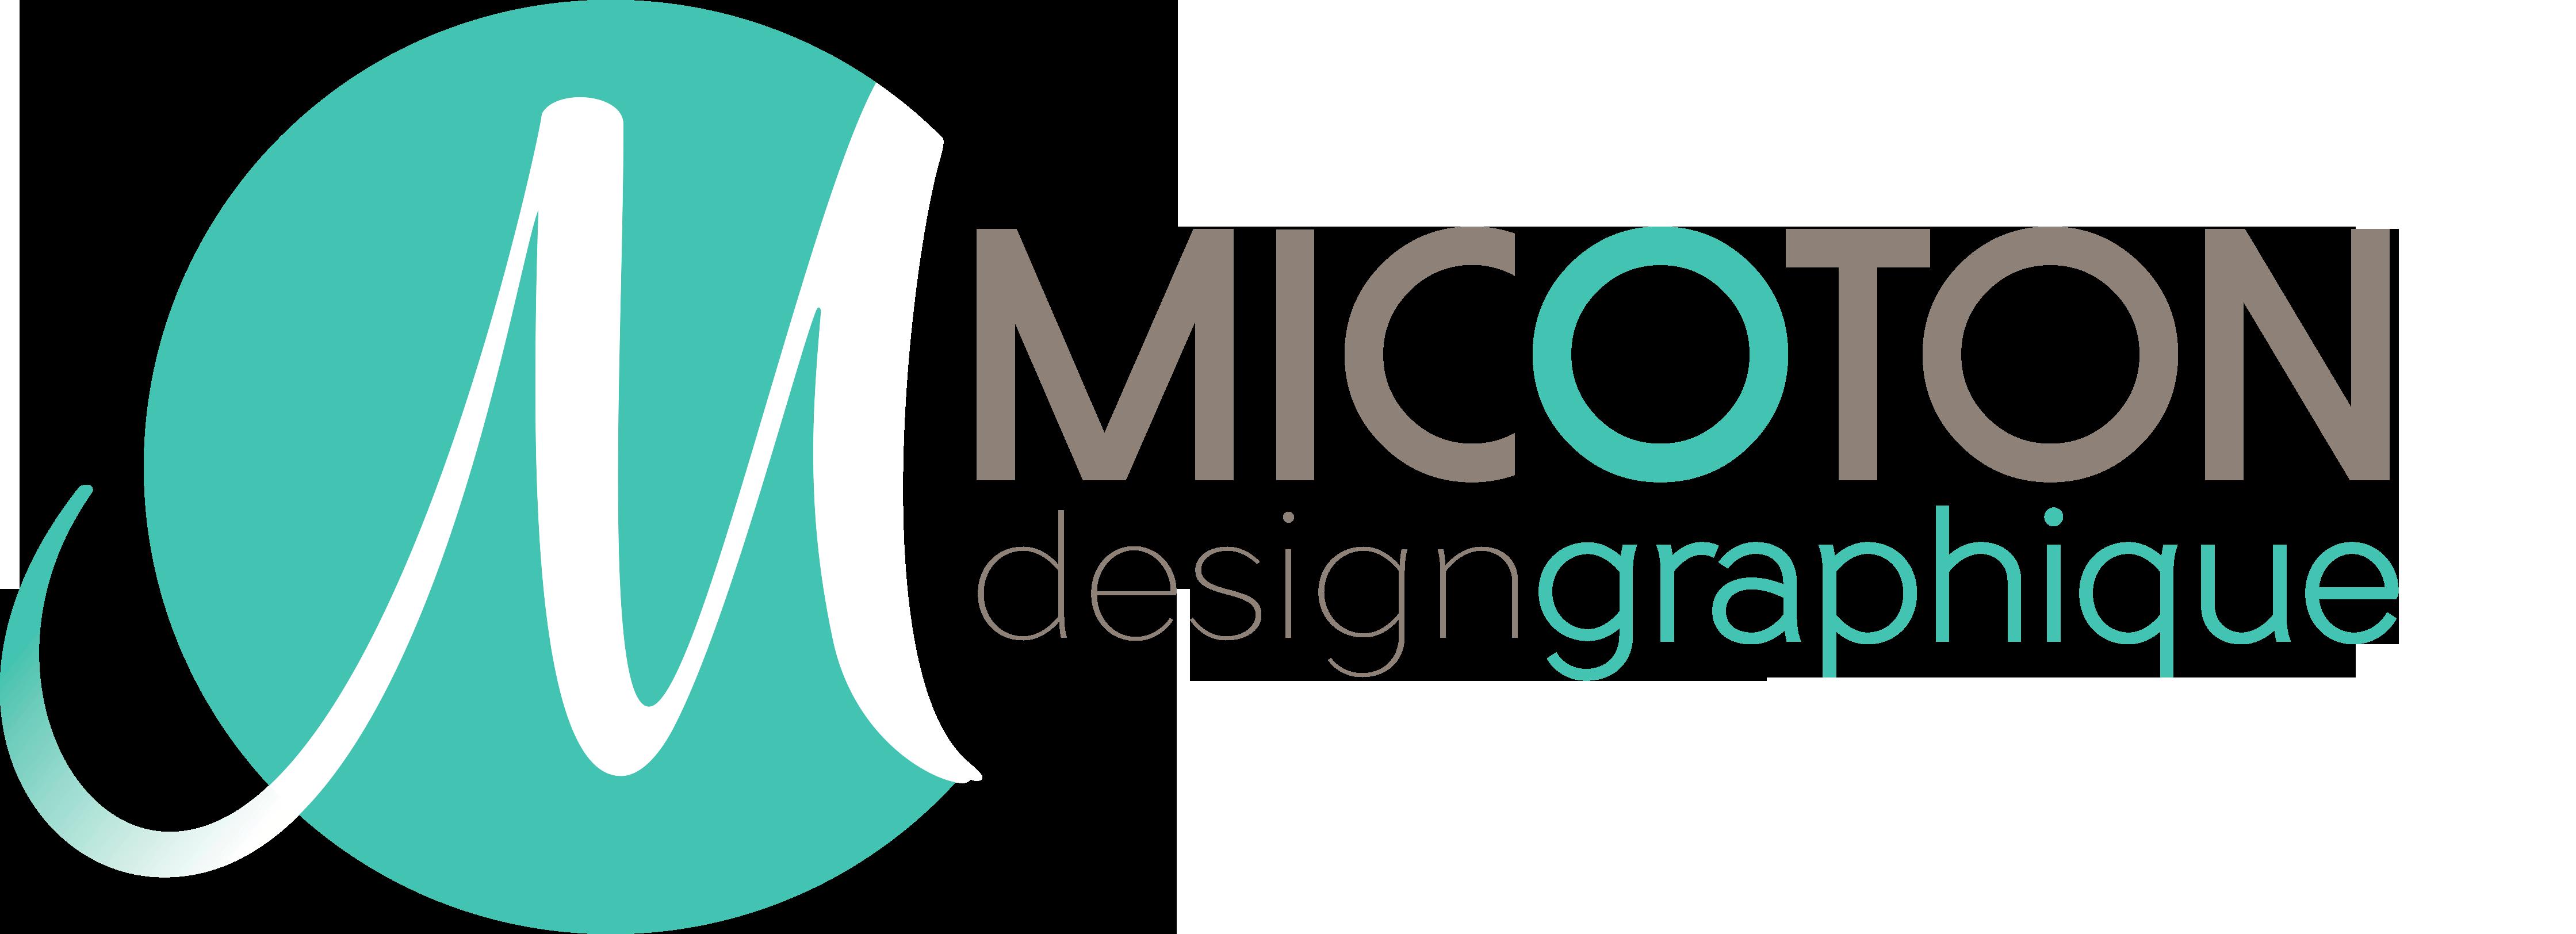 MICOTON Design Graphique